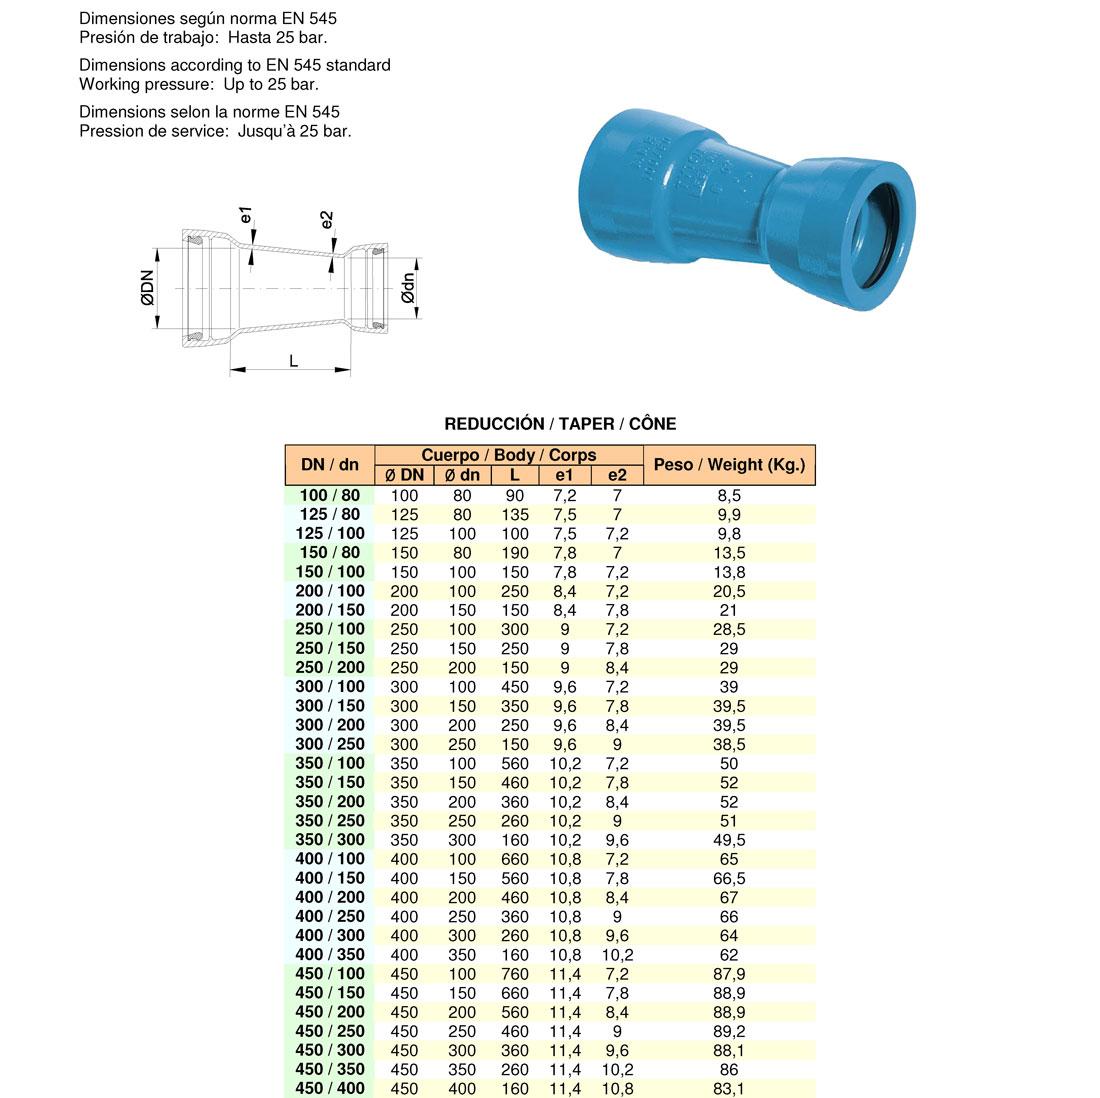 Reducción doble enchufe Push-on. FMK Hidraulic Supplies.